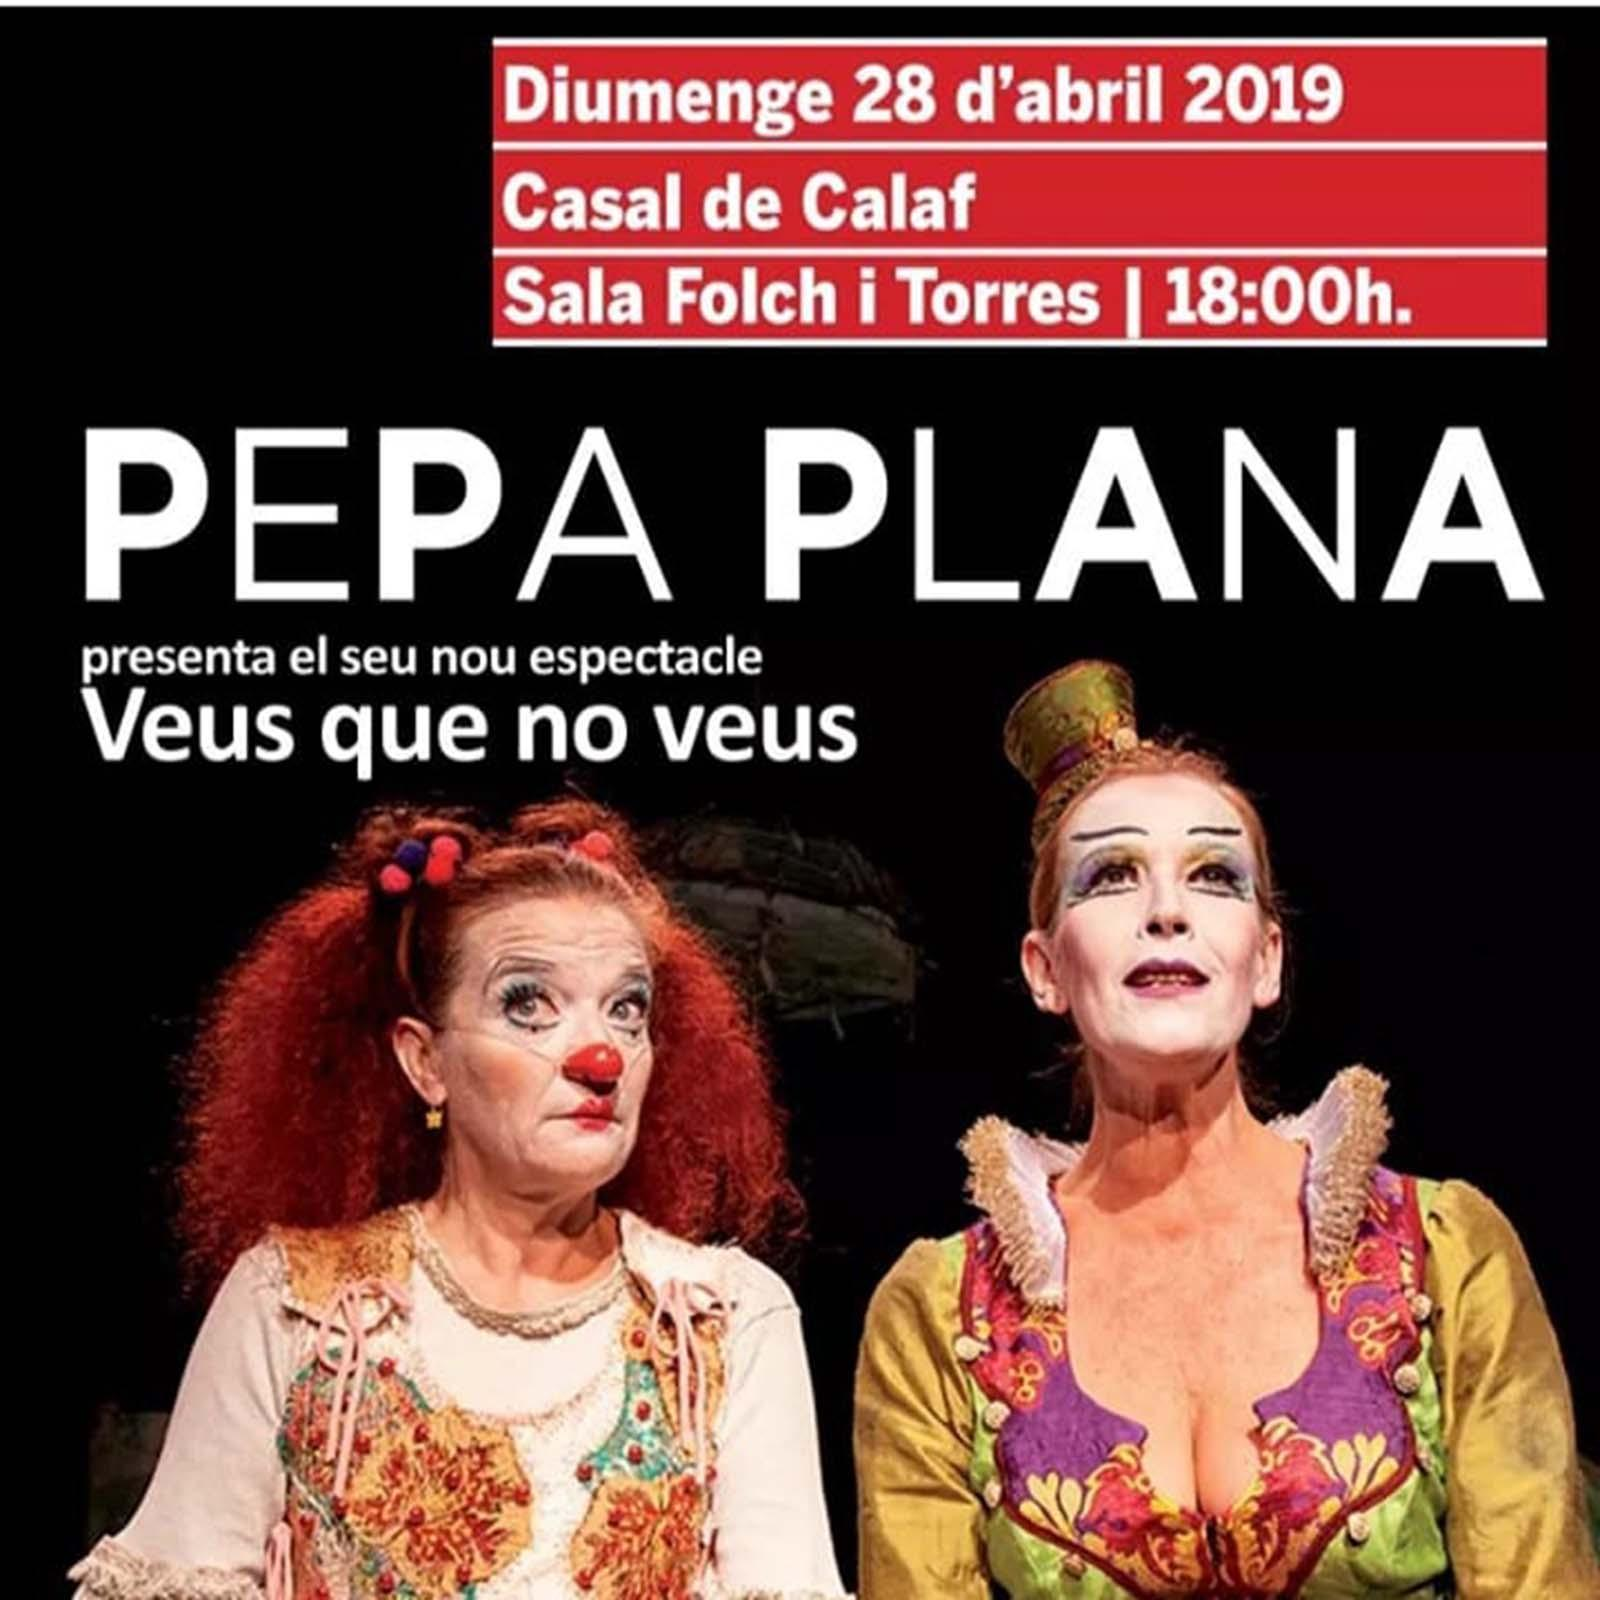 Teatre-clown Pepa Plana  'Veus que no veus'